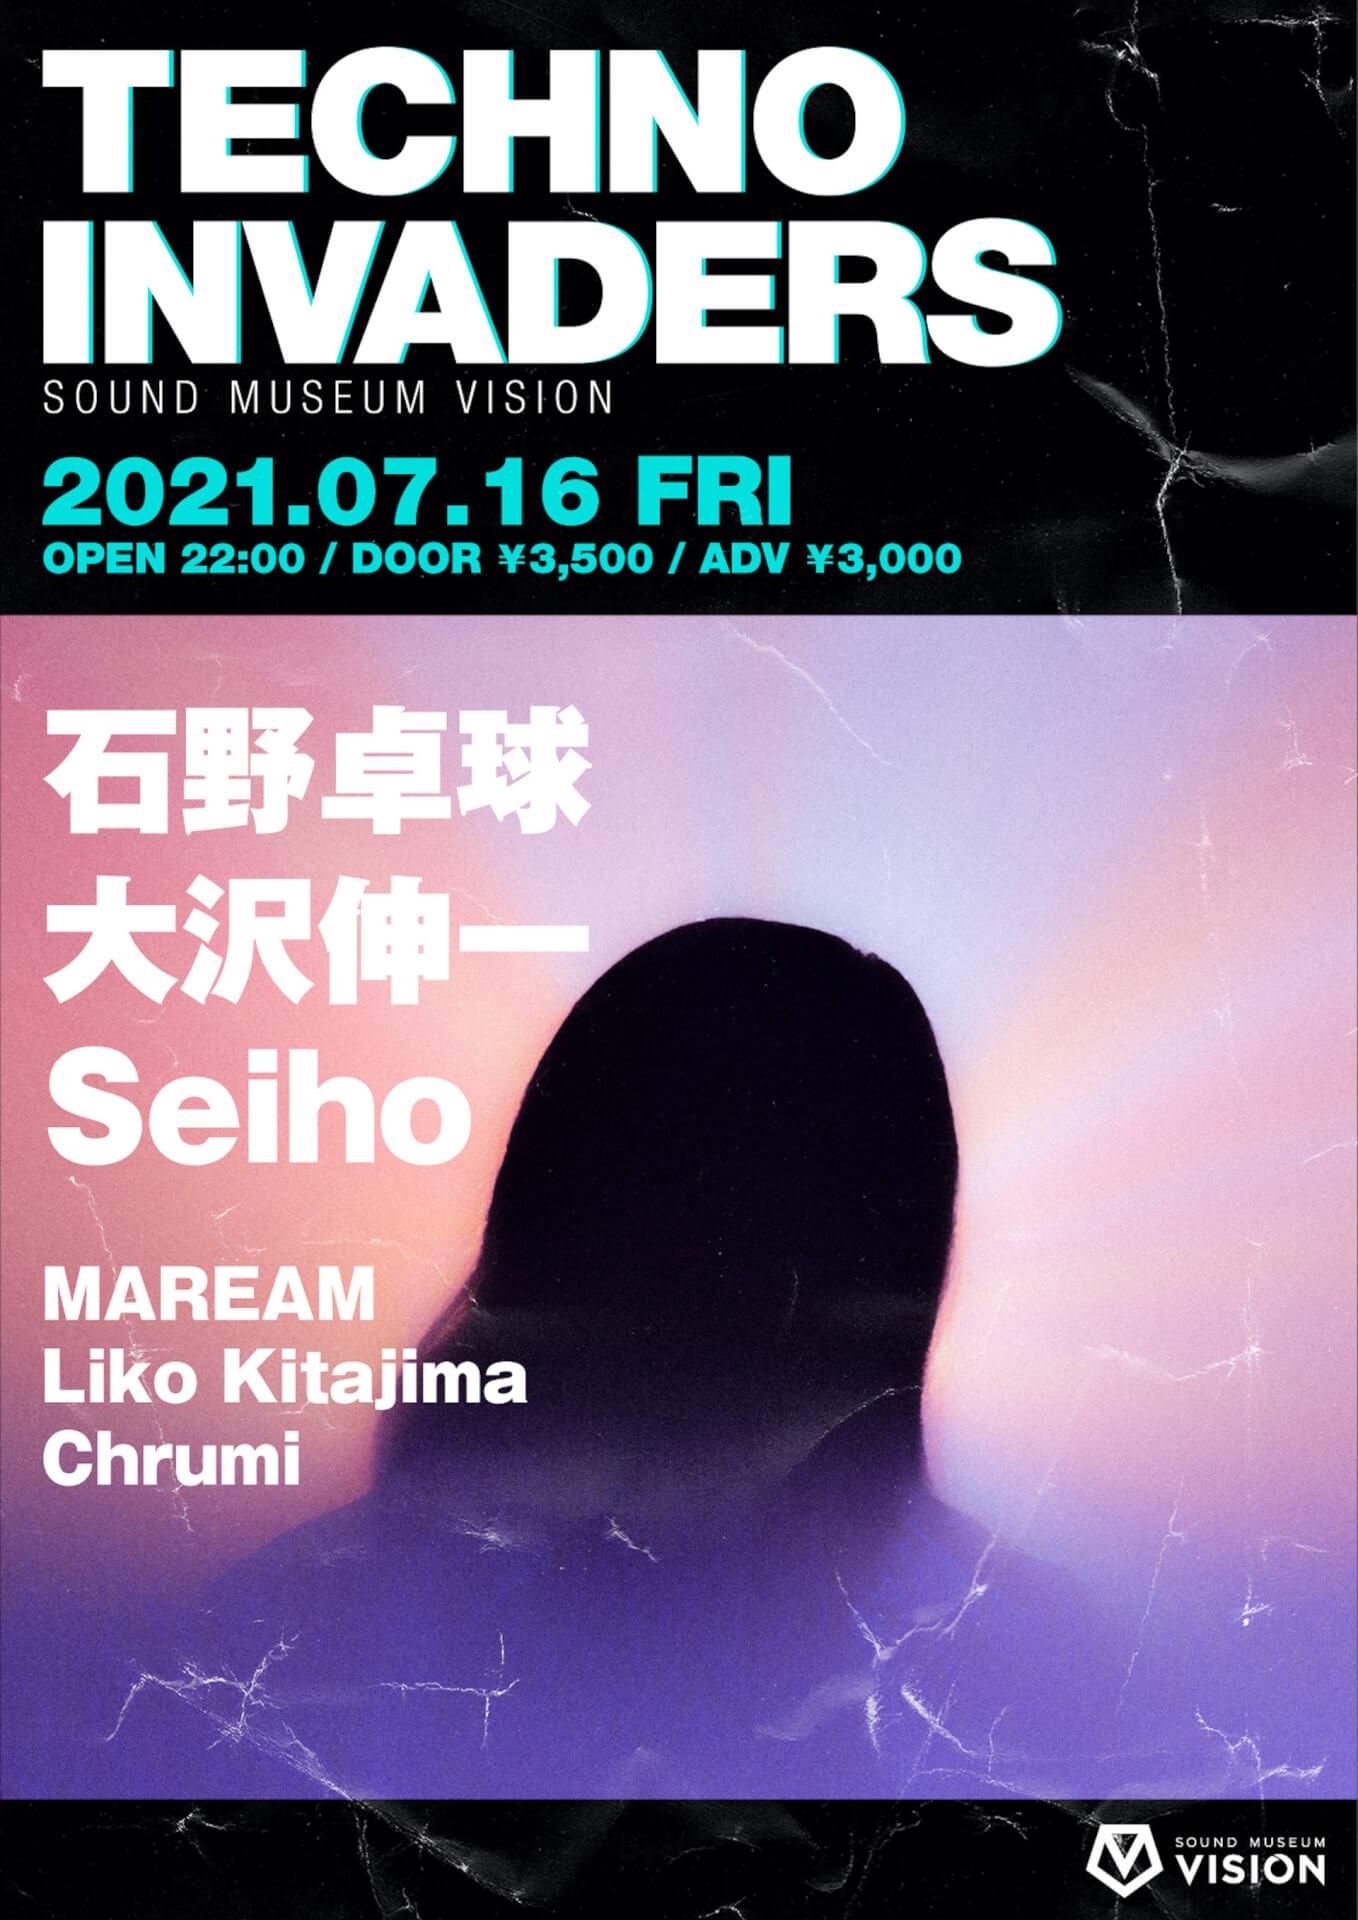 <TECHNO INVADERS>が待望の再開!石野卓球、大沢伸一、Seihoらが参戦 music210615_techno-invaders2